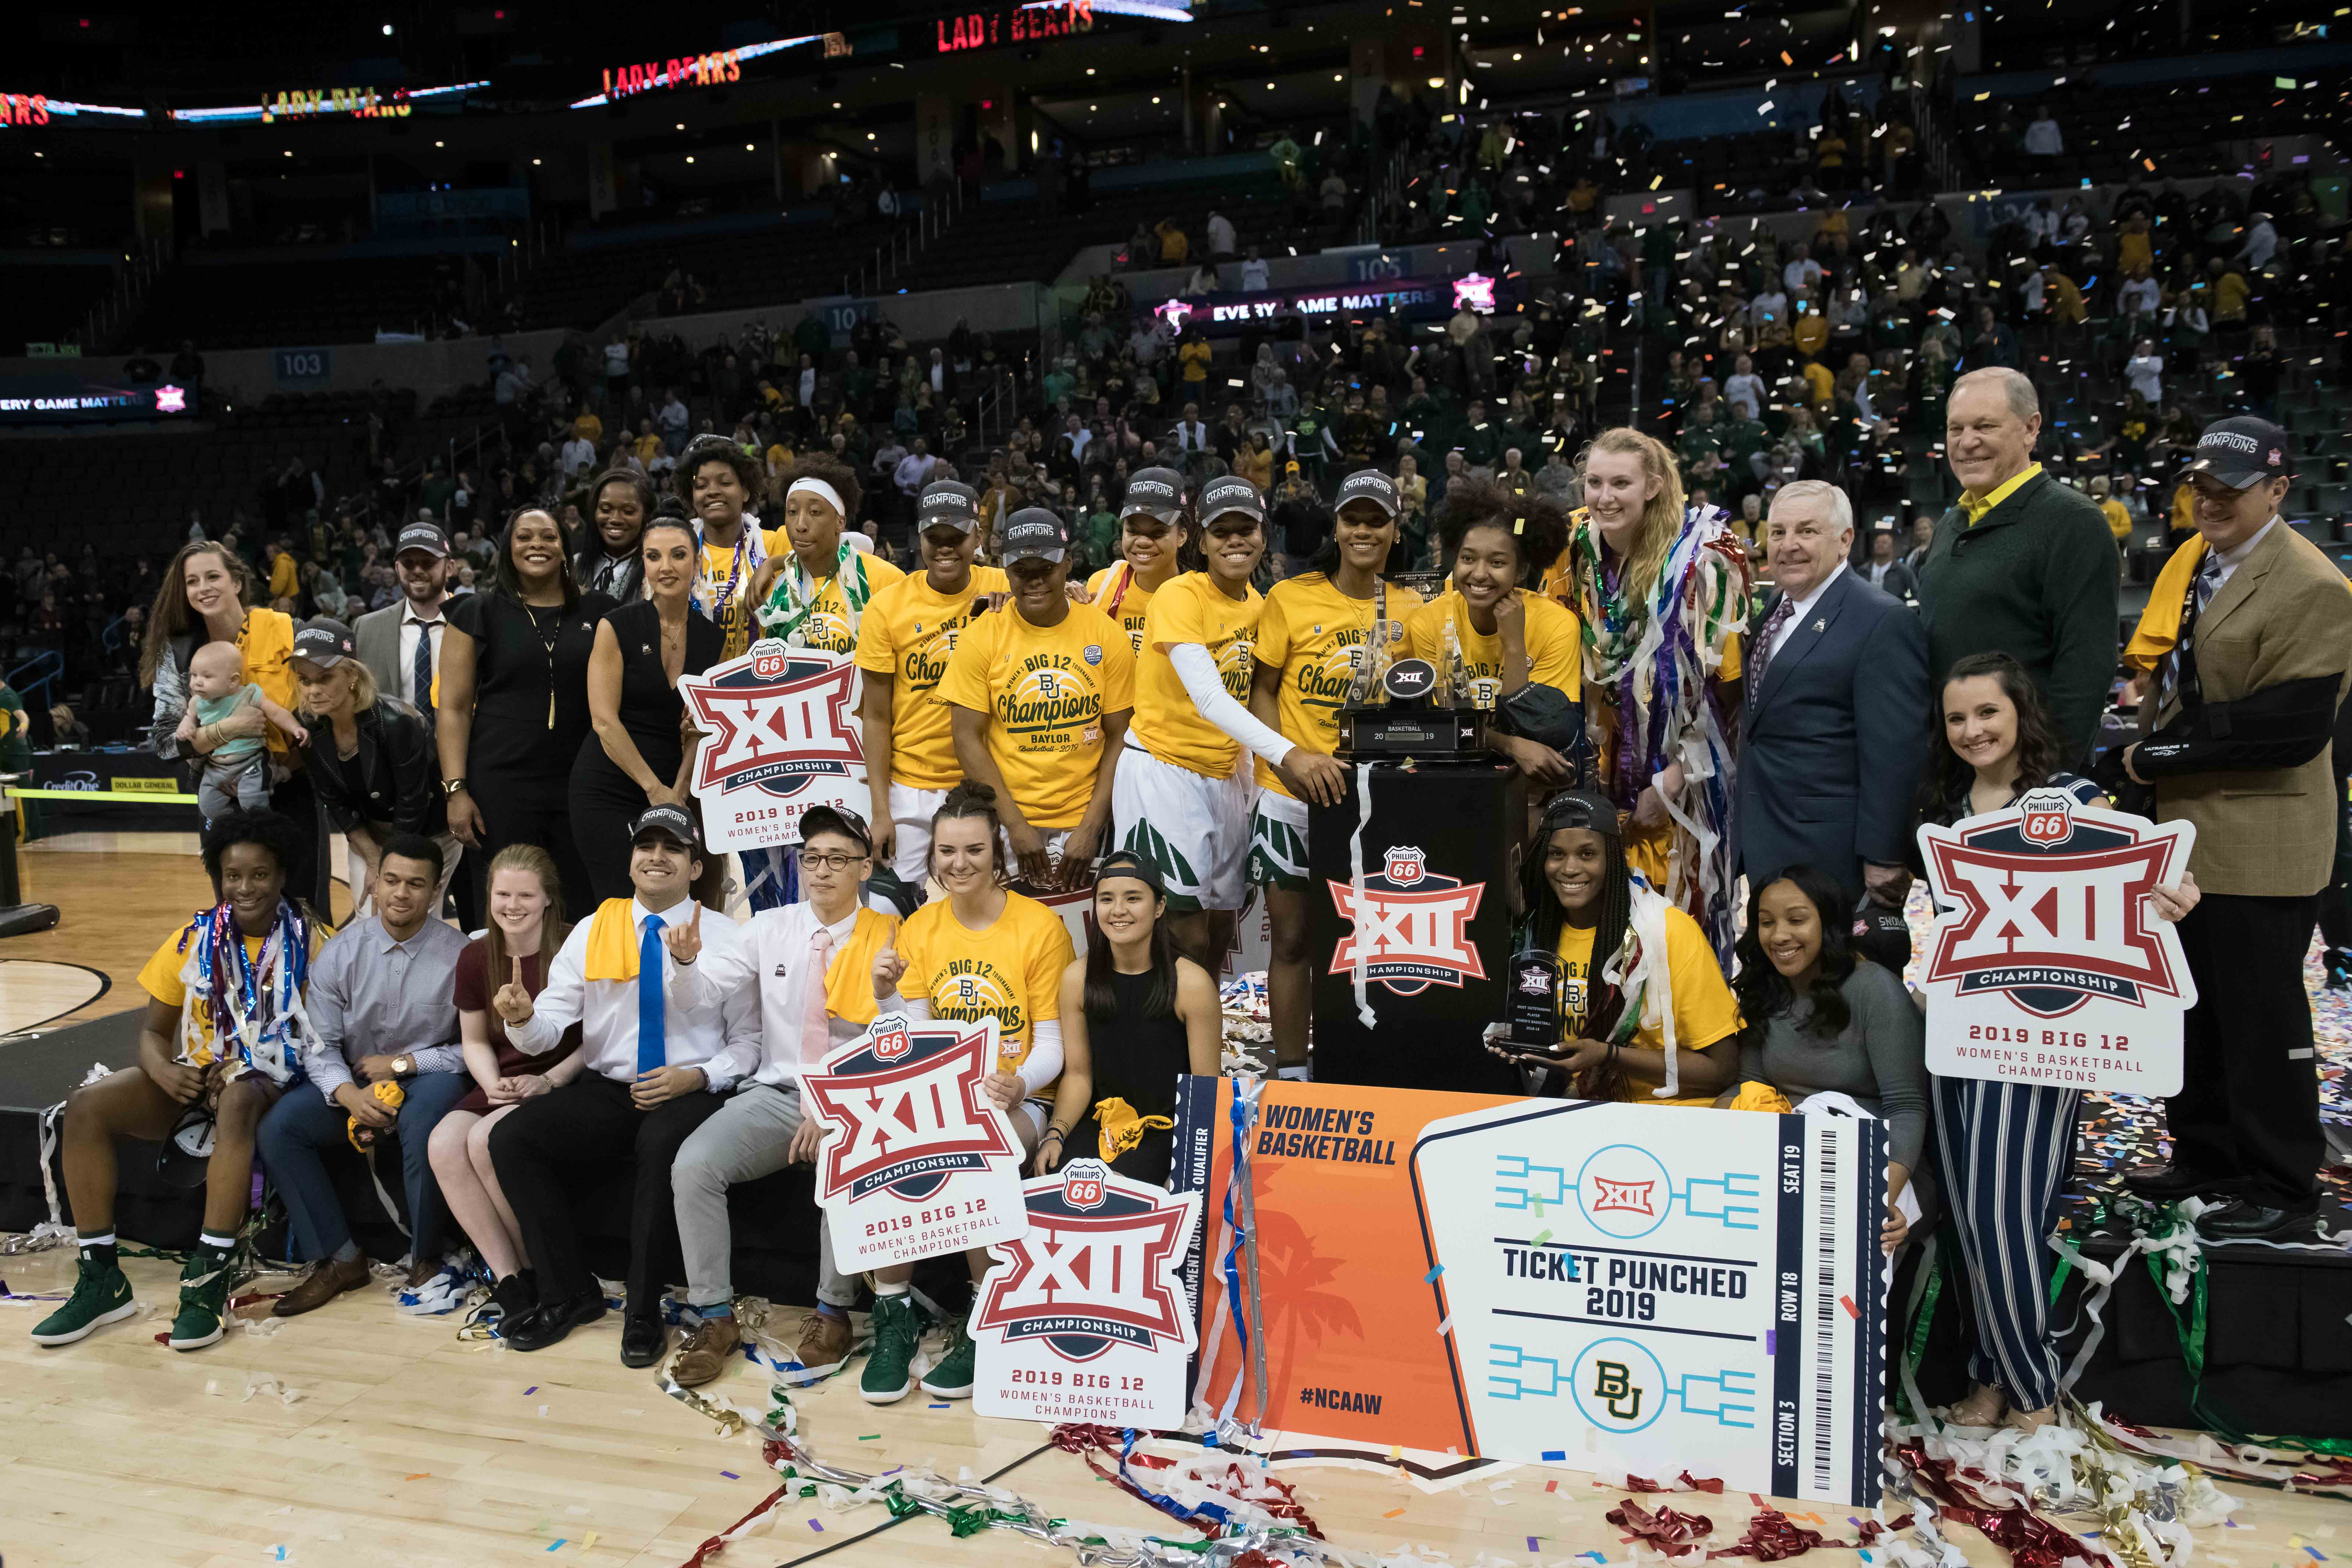 NCAA Womens Basketball: Big 12 Conference Tournament - Iowa State vs Baylor